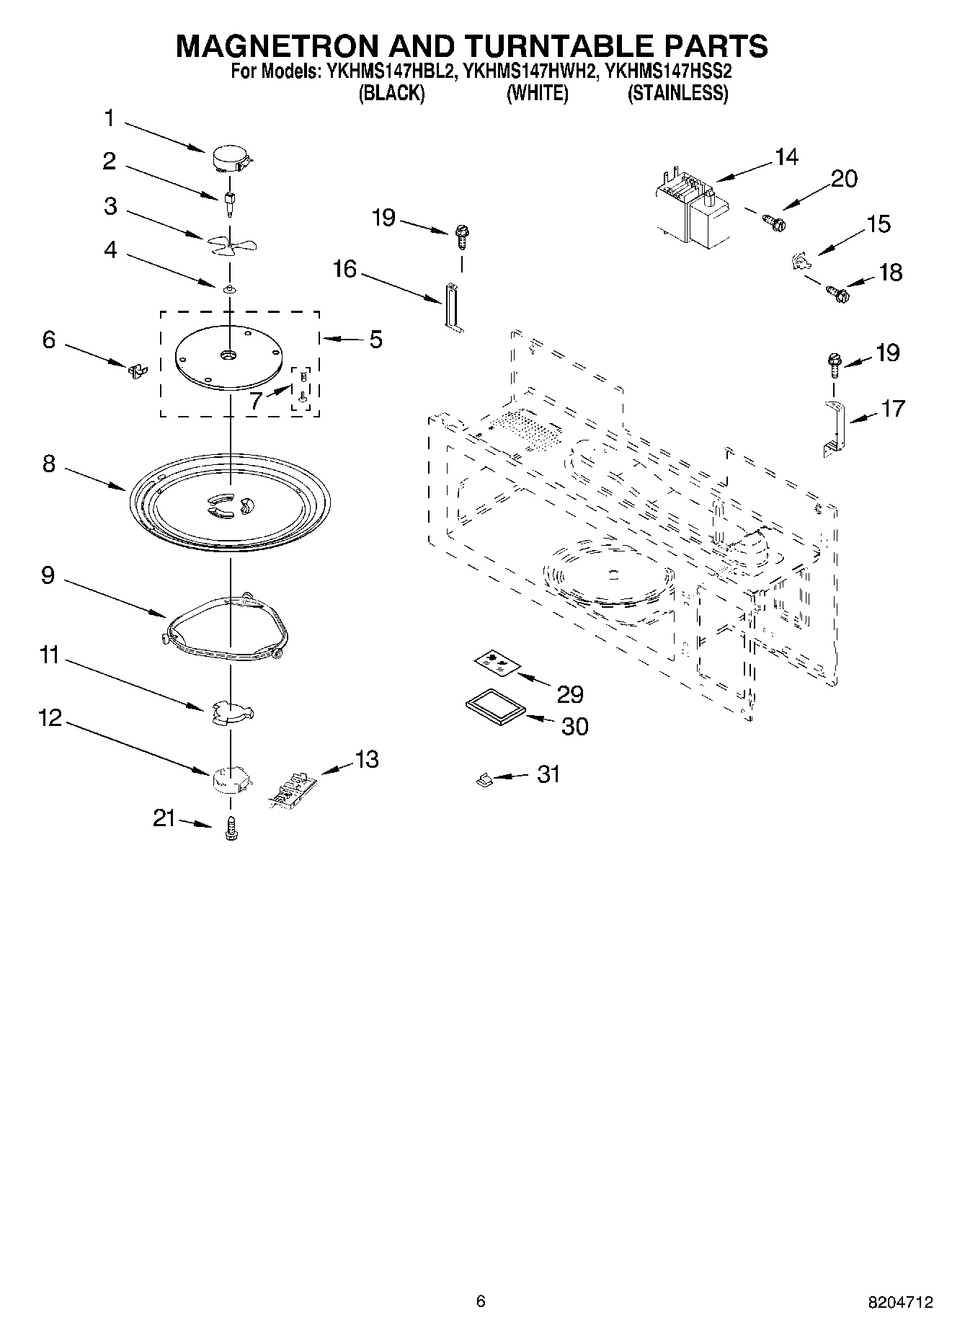 Diagram for YKHMS147HWH2